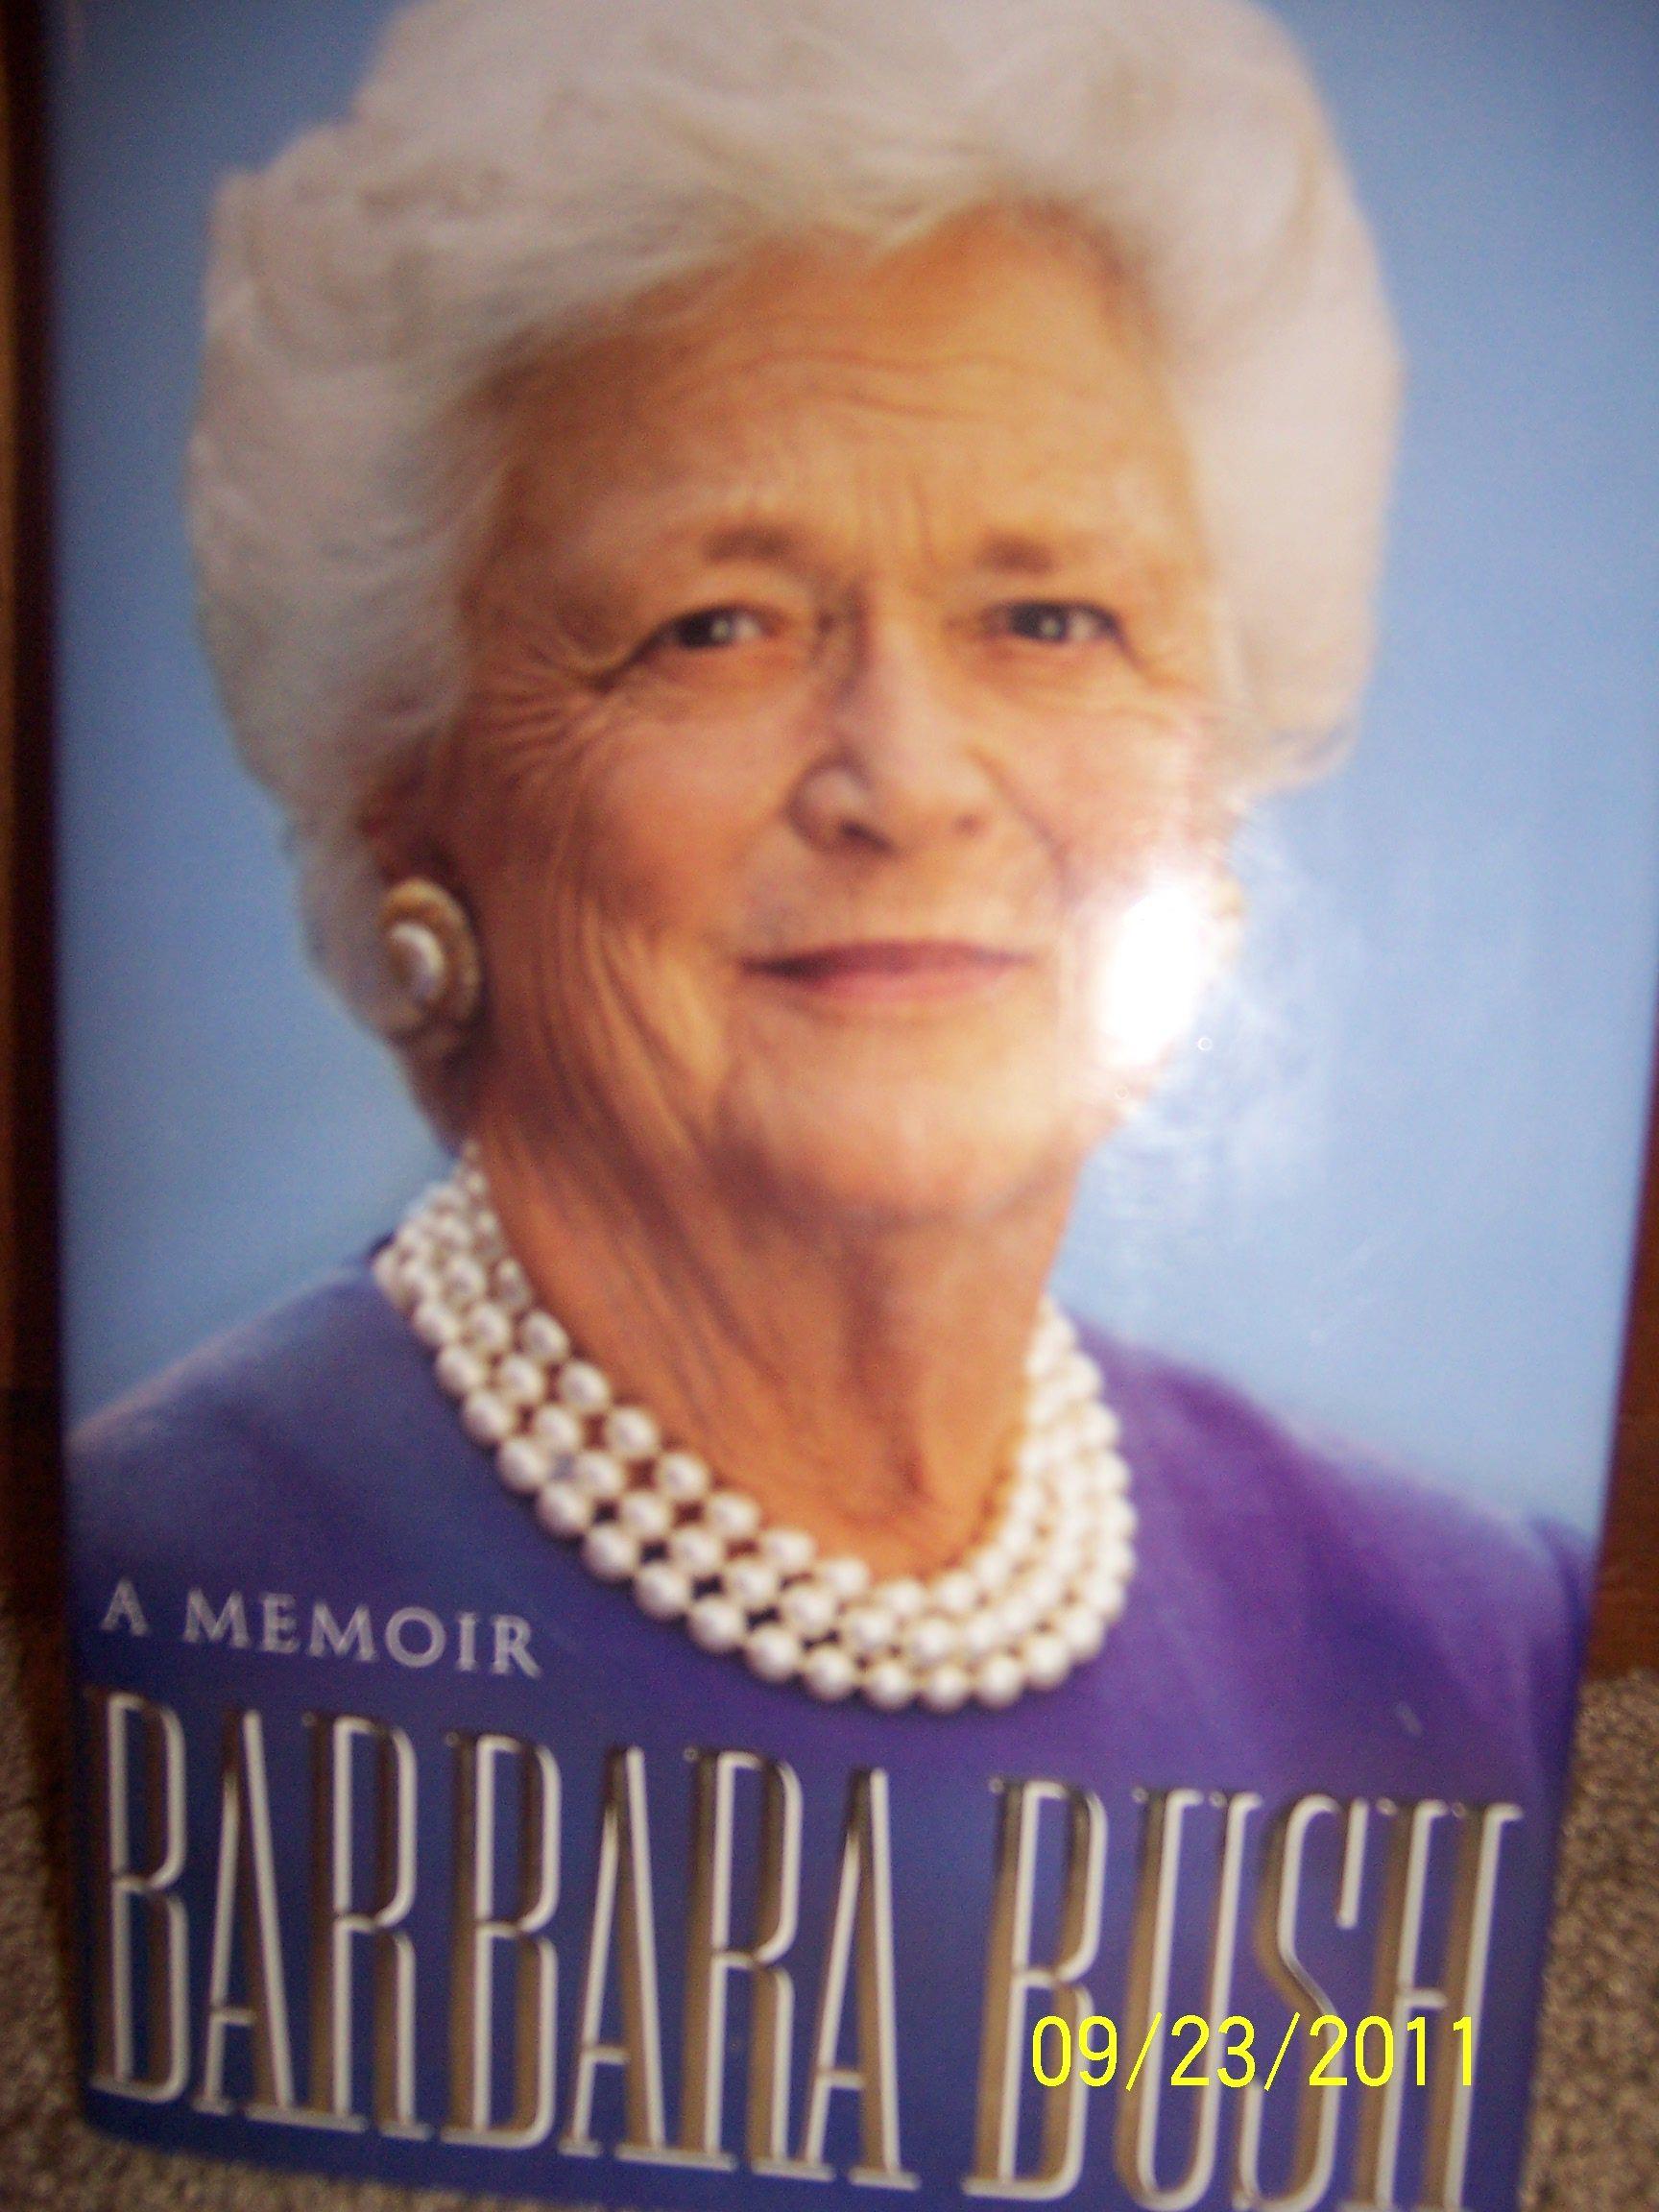 barbara bush autographed memoir in dcbaugh81's Garage Sale in Jefferson , IA for $30.00. 1st edition